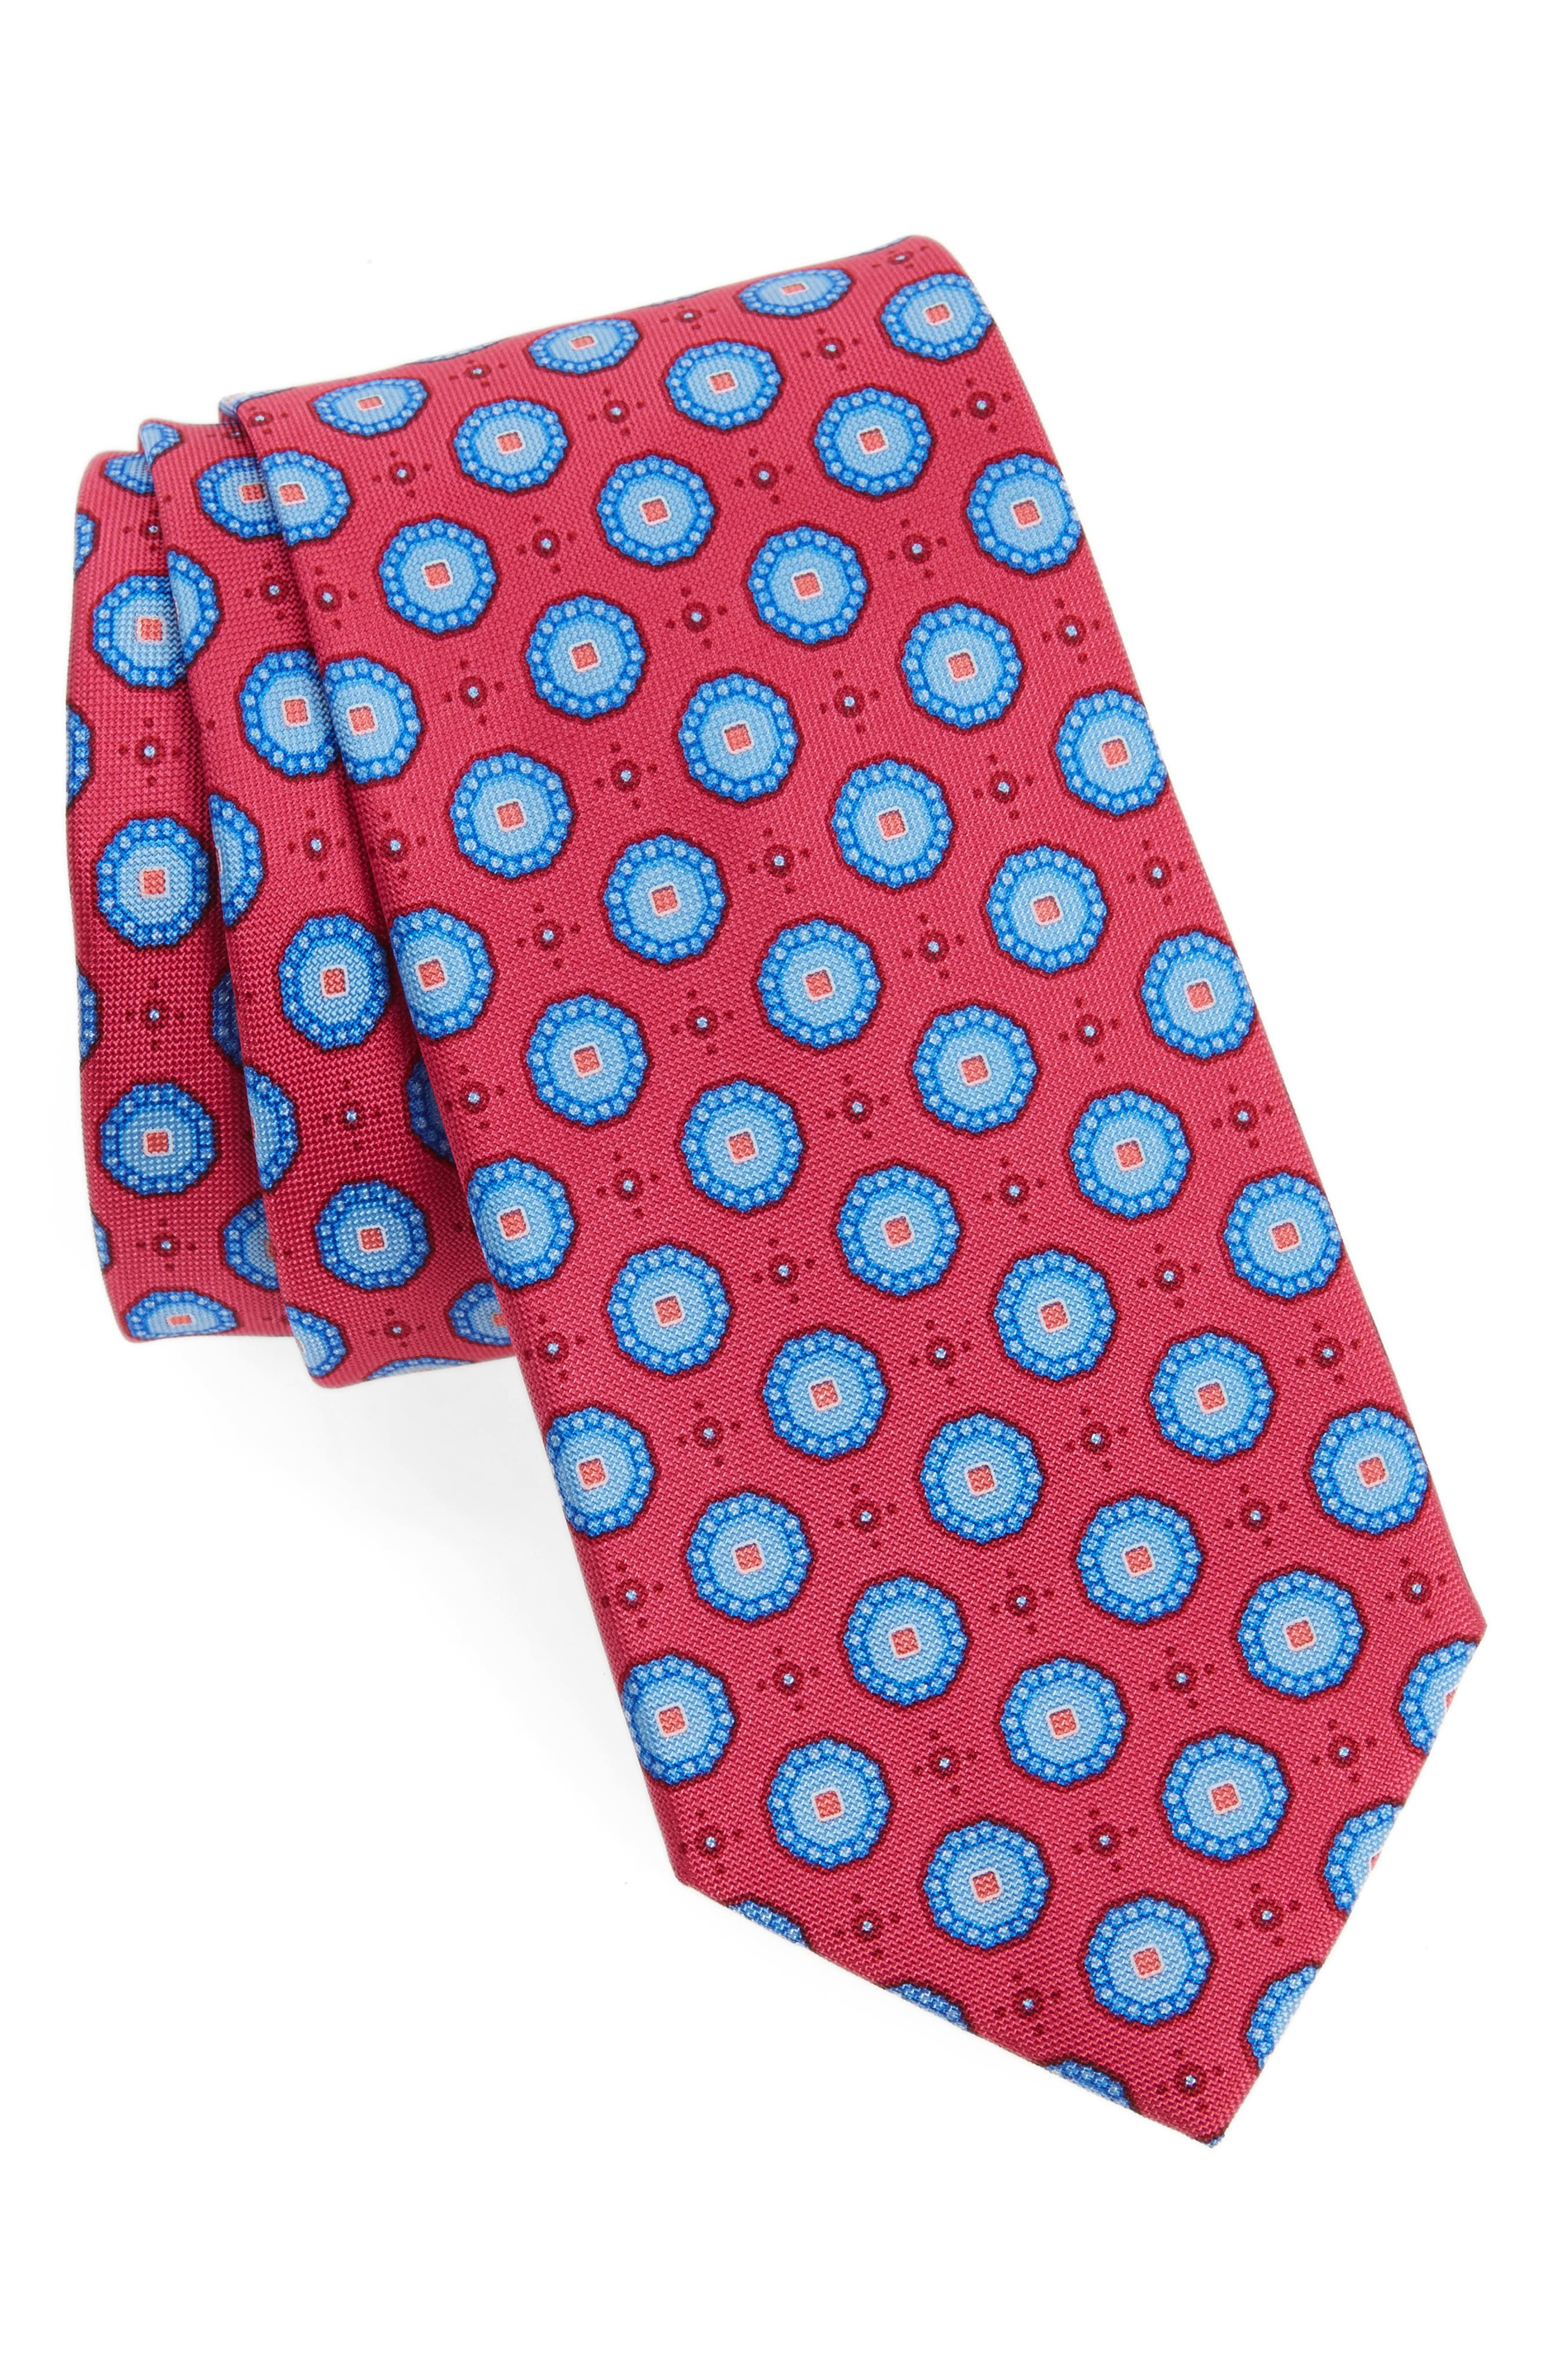 Alternate Image 1 Selected - Nordstrom Men's Shop Textured Pines Geometric Silk Tie